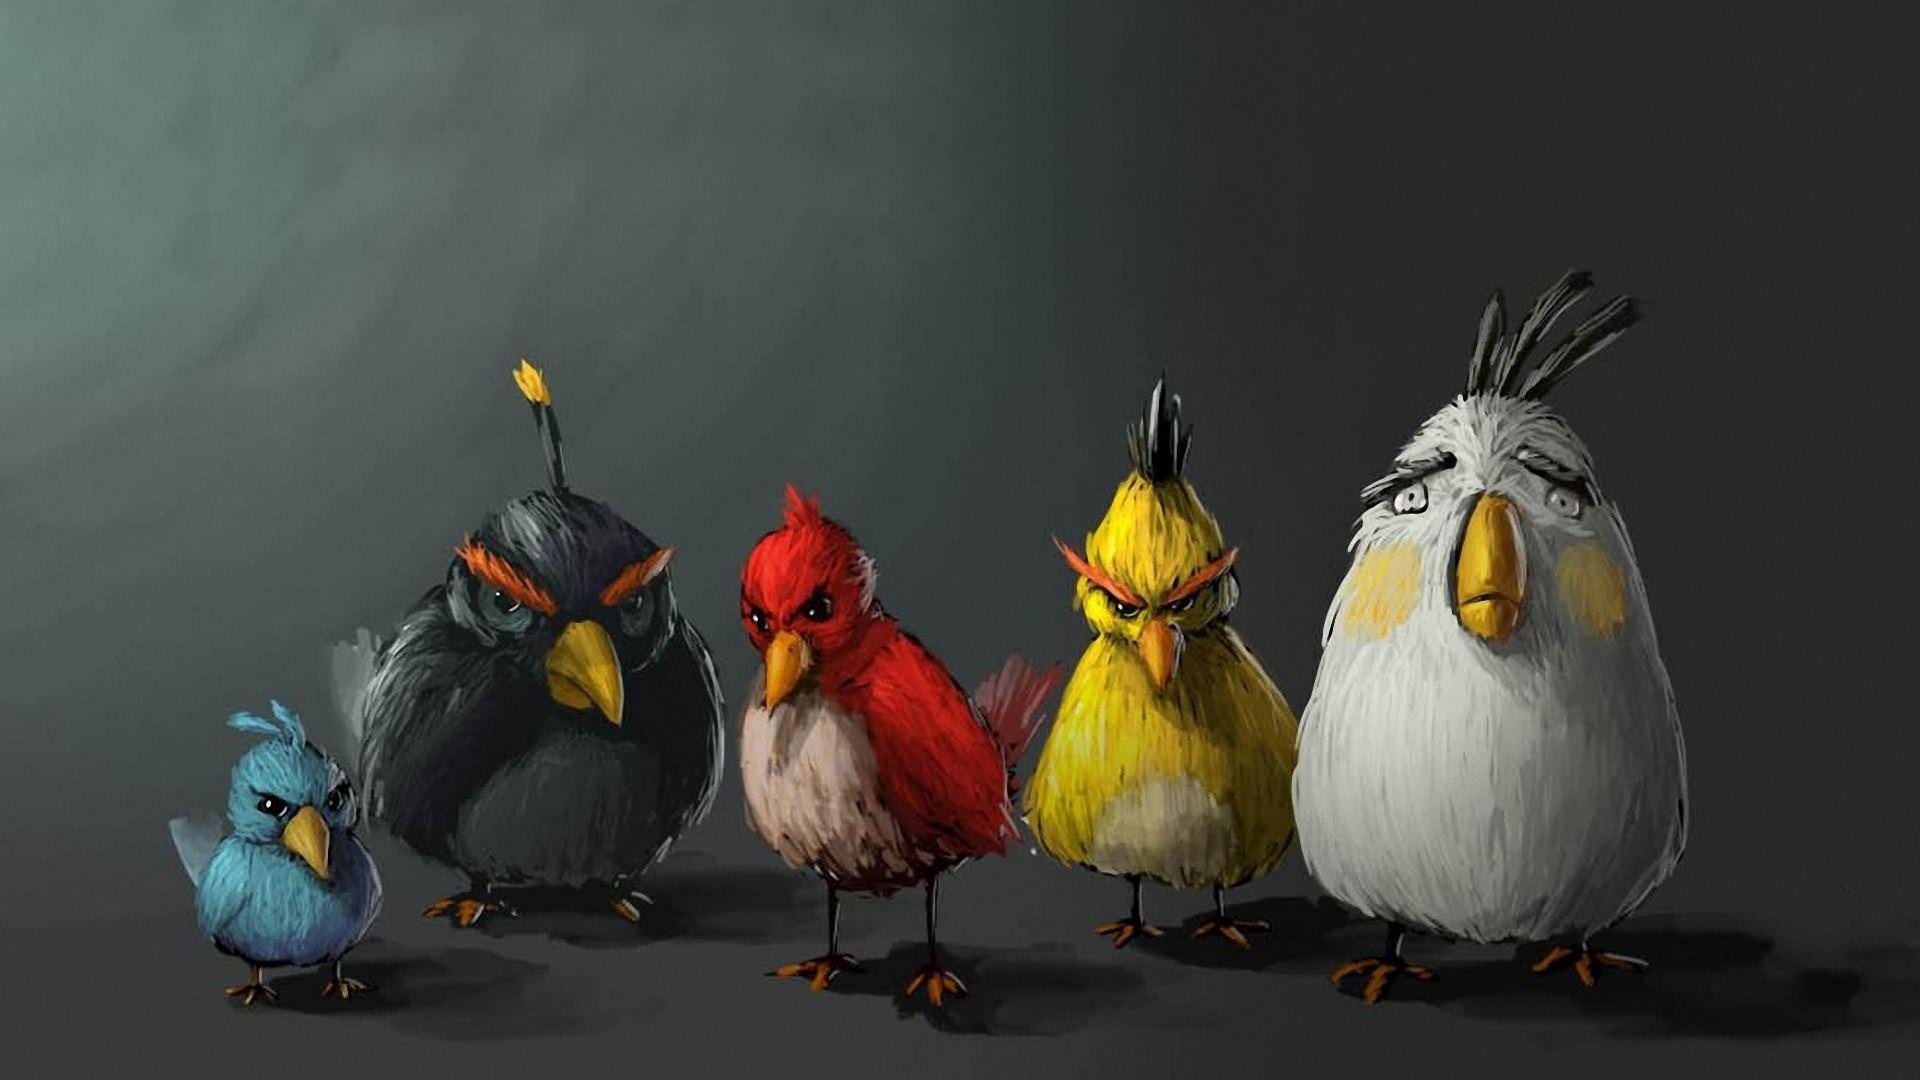 http://2.bp.blogspot.com/-PQUuzUXLzS4/UEMJD06UAAI/AAAAAAAAISU/4K1in-N3PNg/s0/angry-birds-drawing-1920x1080-wallpaper.jpg